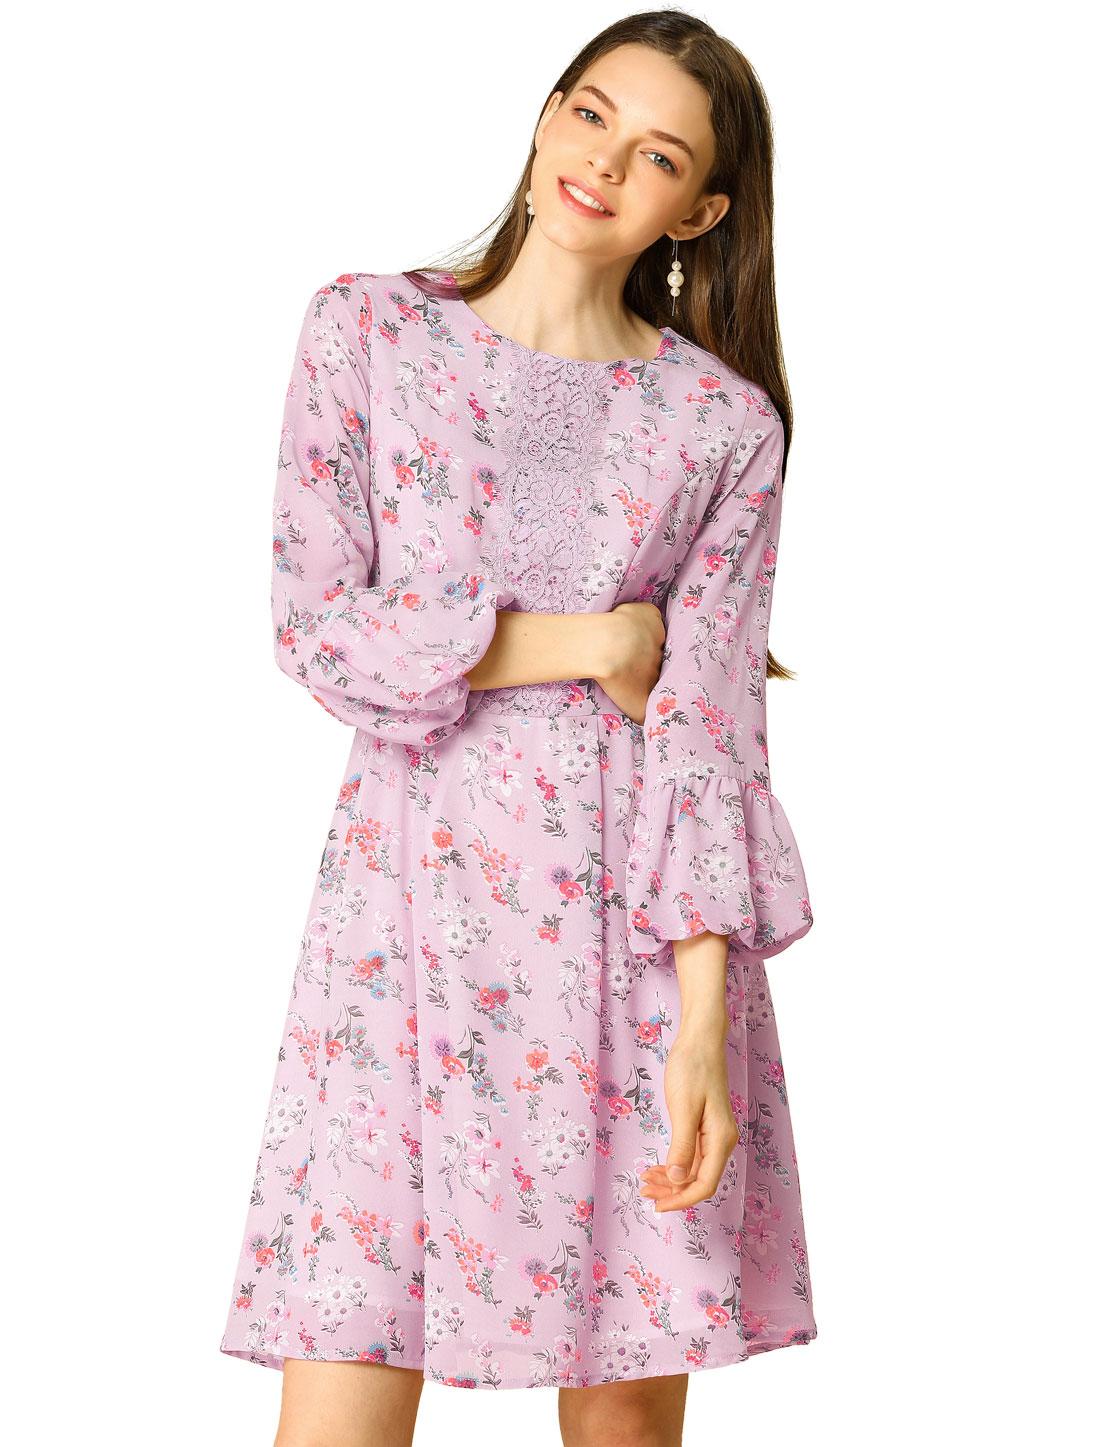 Women's Vintage Lantern Sleeves Lace Splice Chiffon Floral Flare Dress Purple L